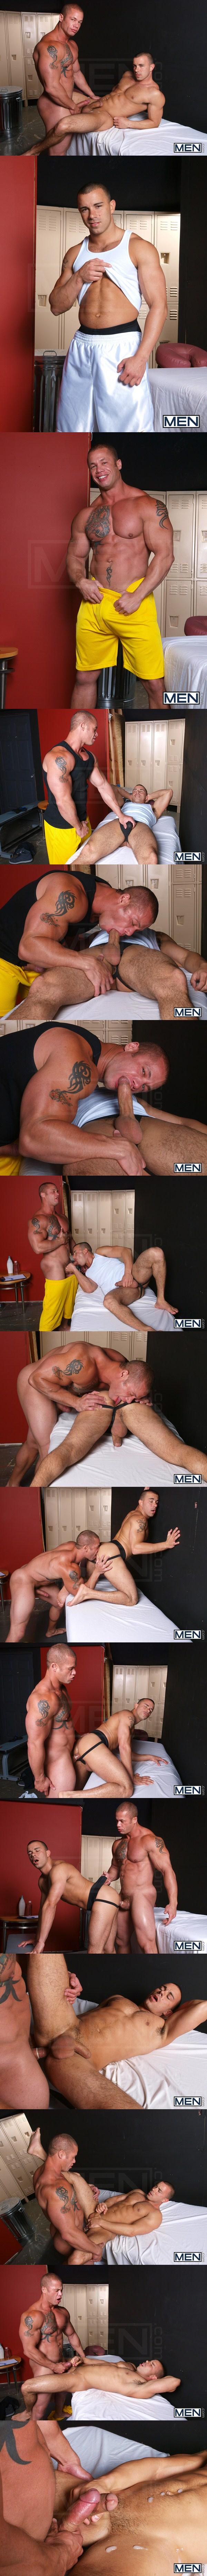 Muscular Matthew Rush tops handsome Chris Tyler at Bigdicksatschool 02